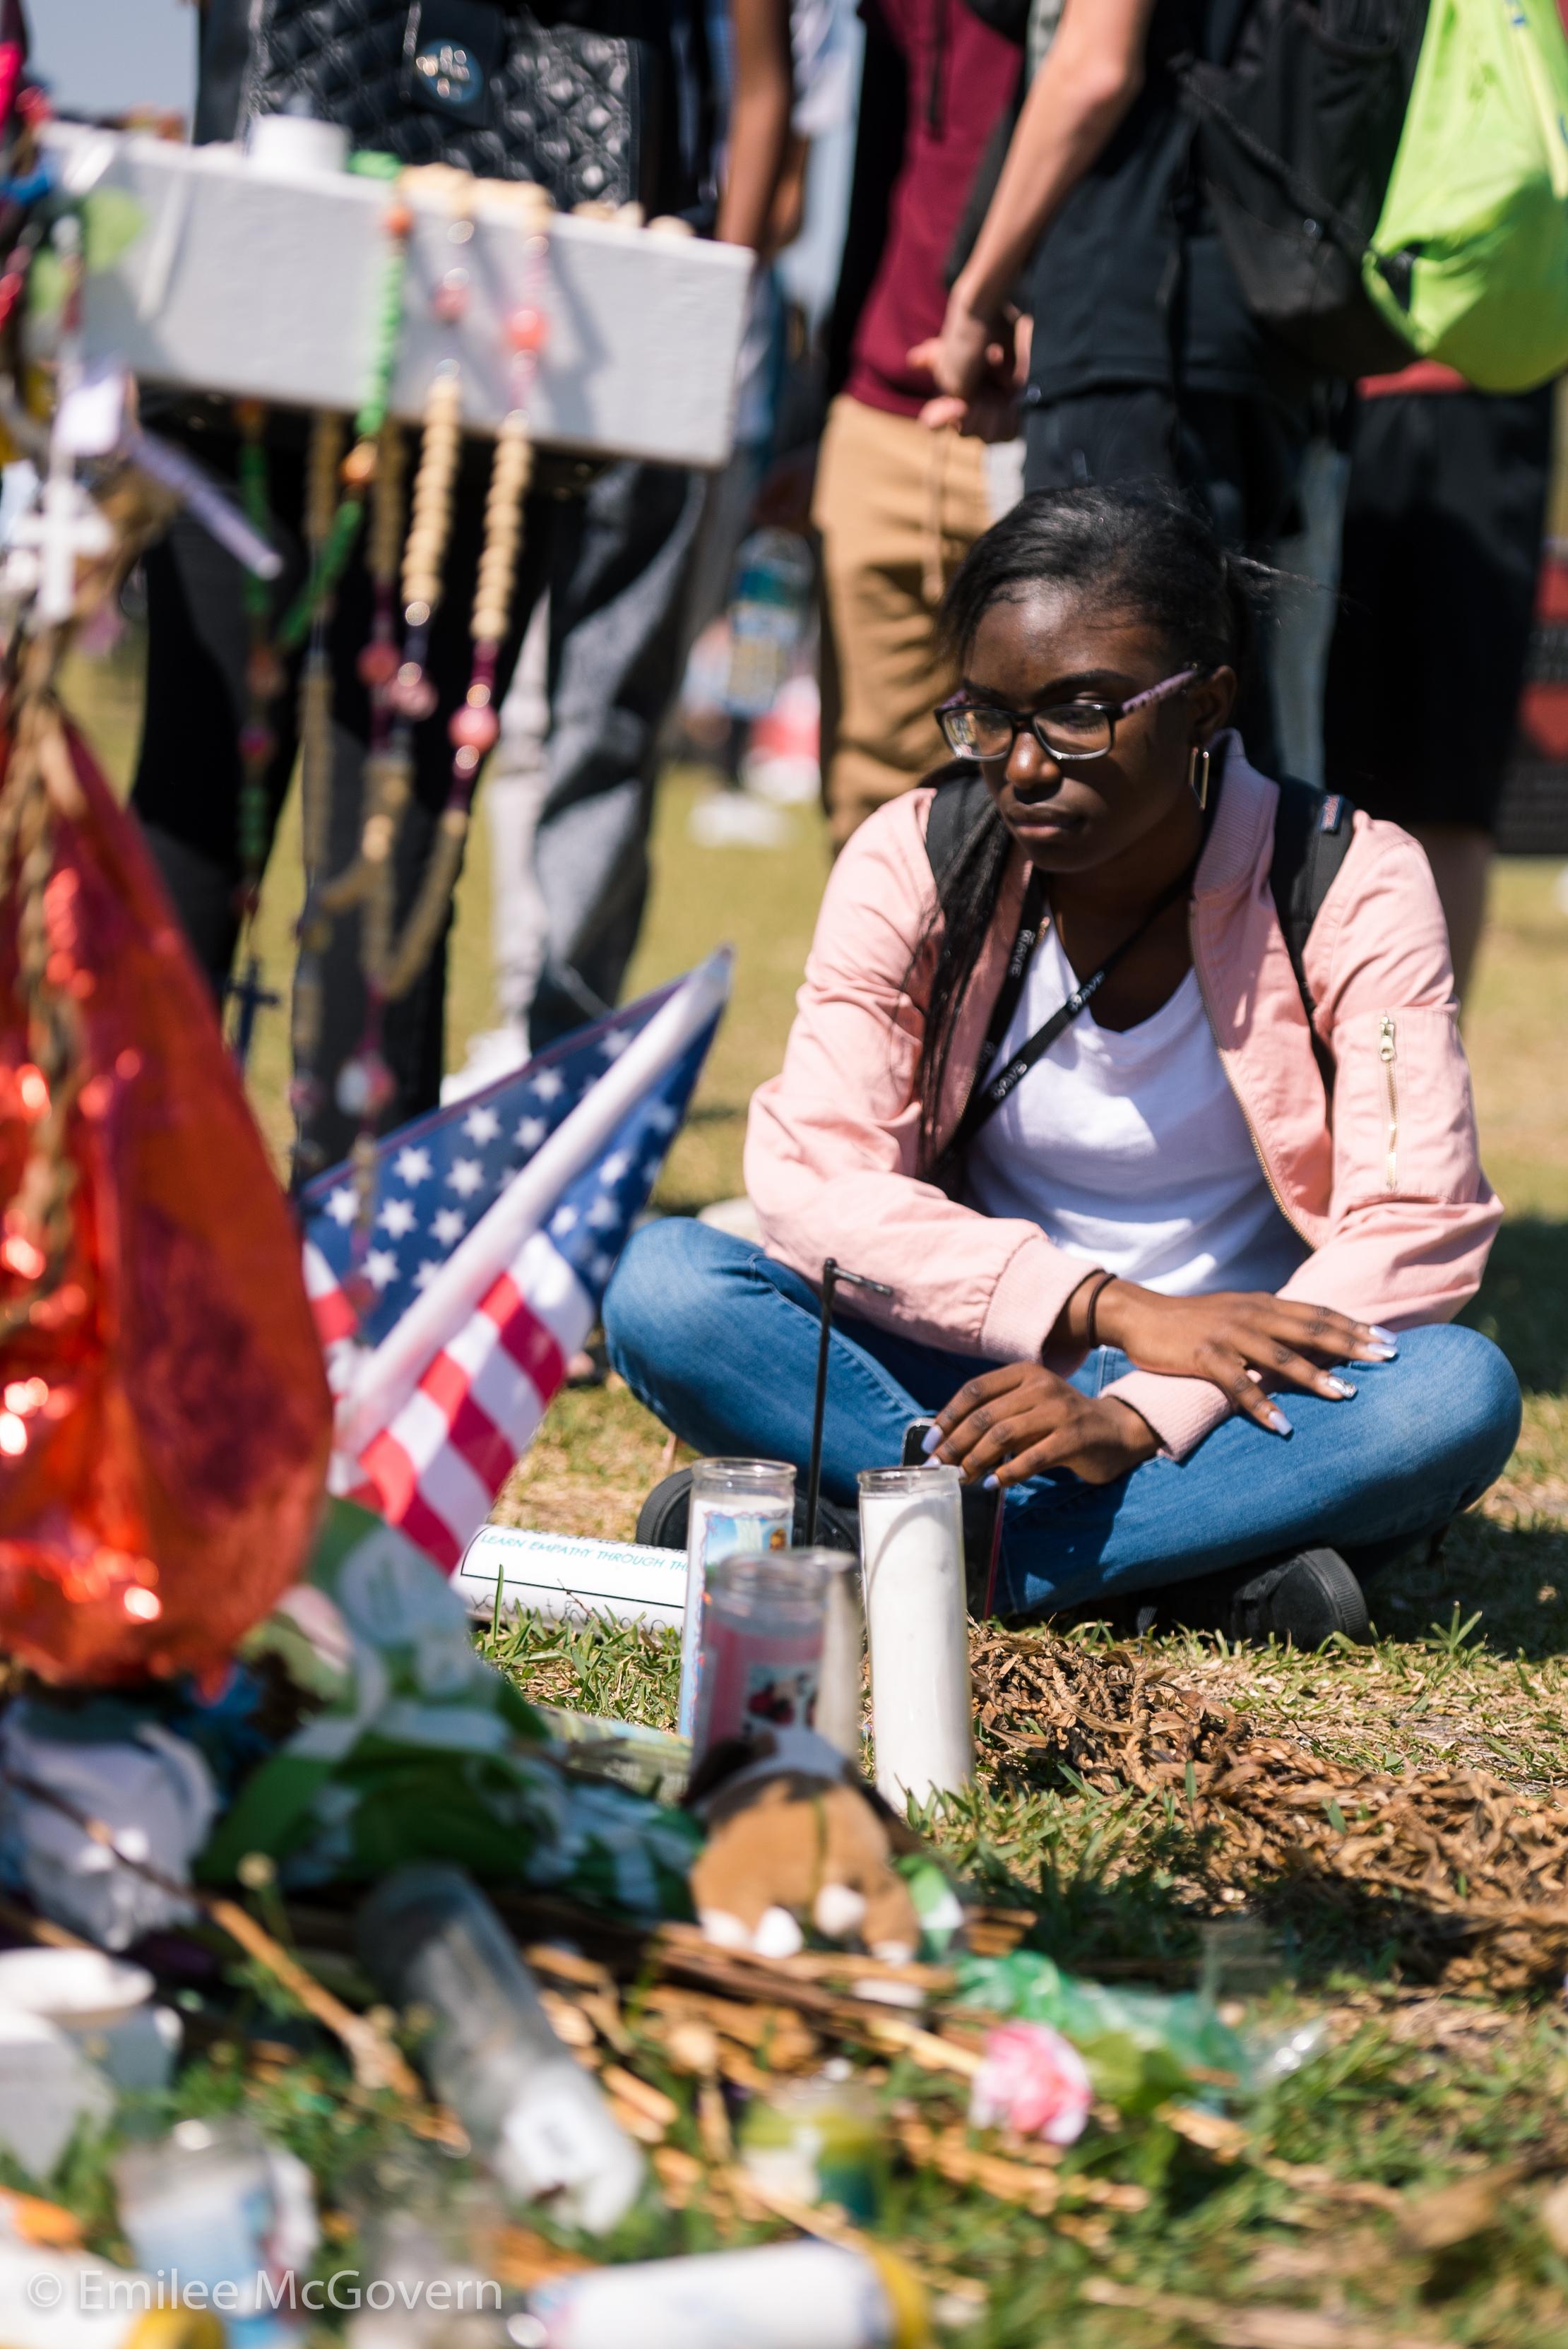 Marjory Stoneman Douglas School Shooting never again enough is enough emma gonzalez david hogg msd national school walkout -111.jpg